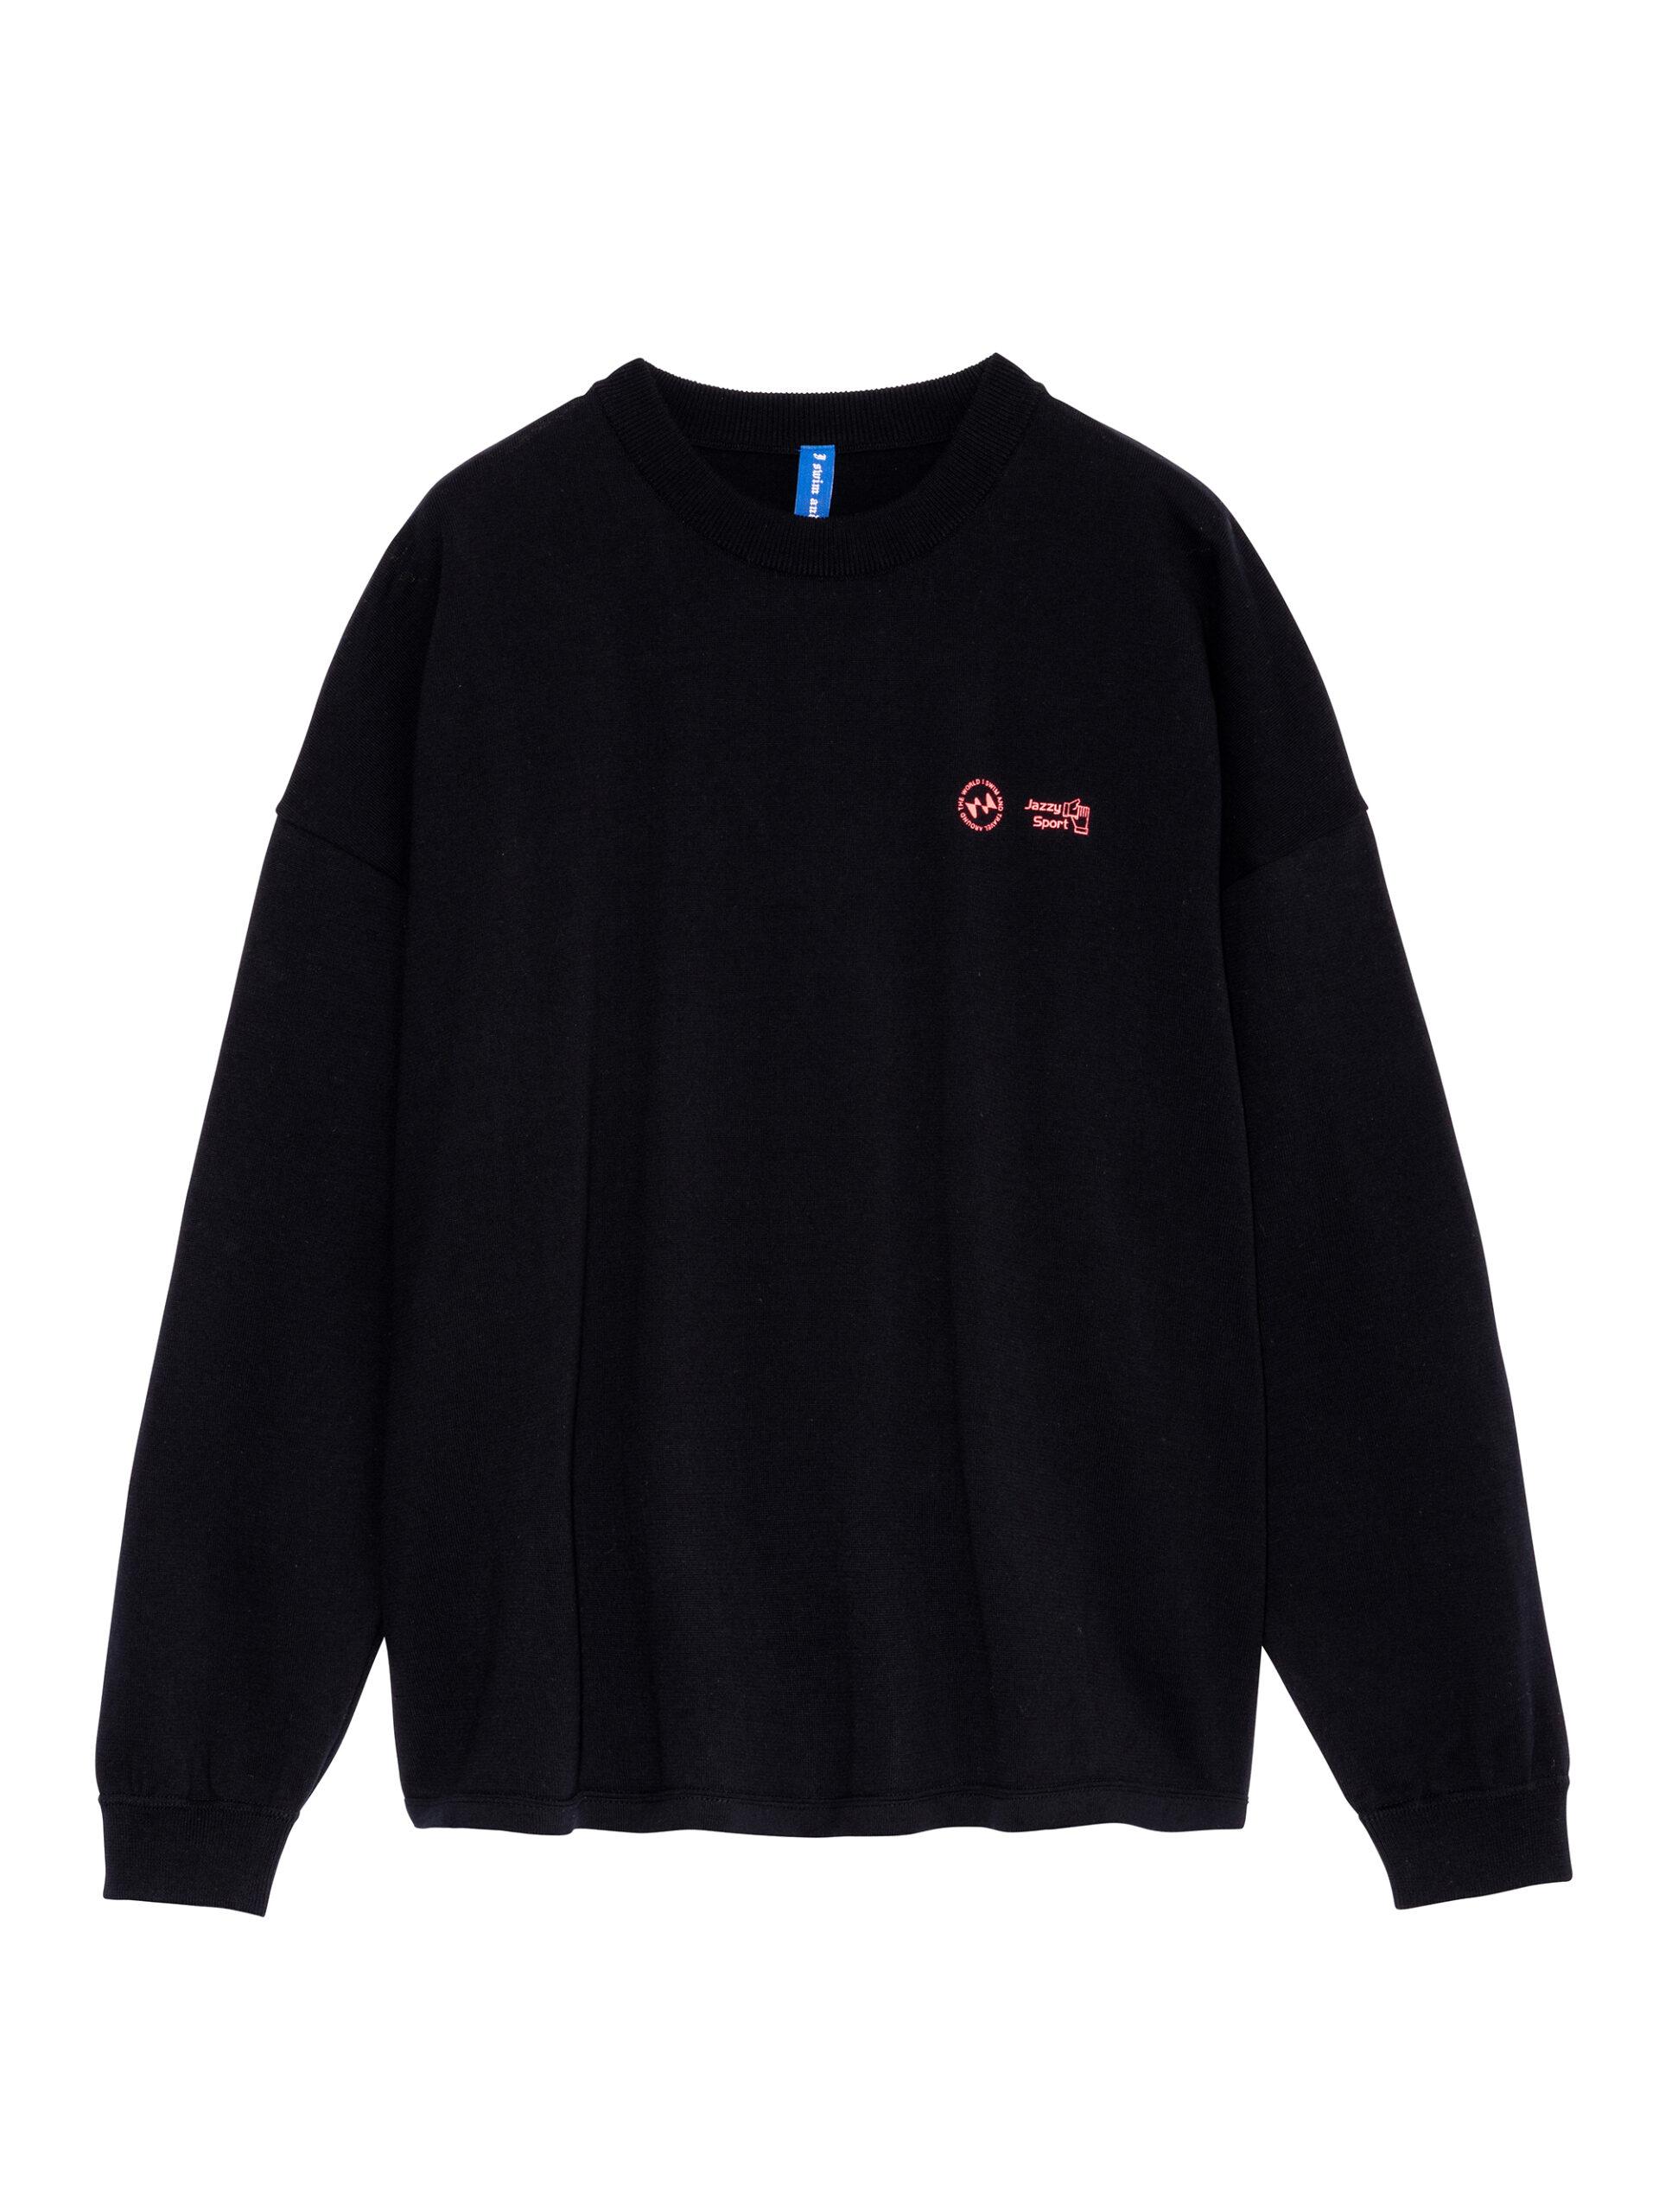 I SWIM × JAZZY SPORT Organic Knit Long Sleeve Tee 002-Black